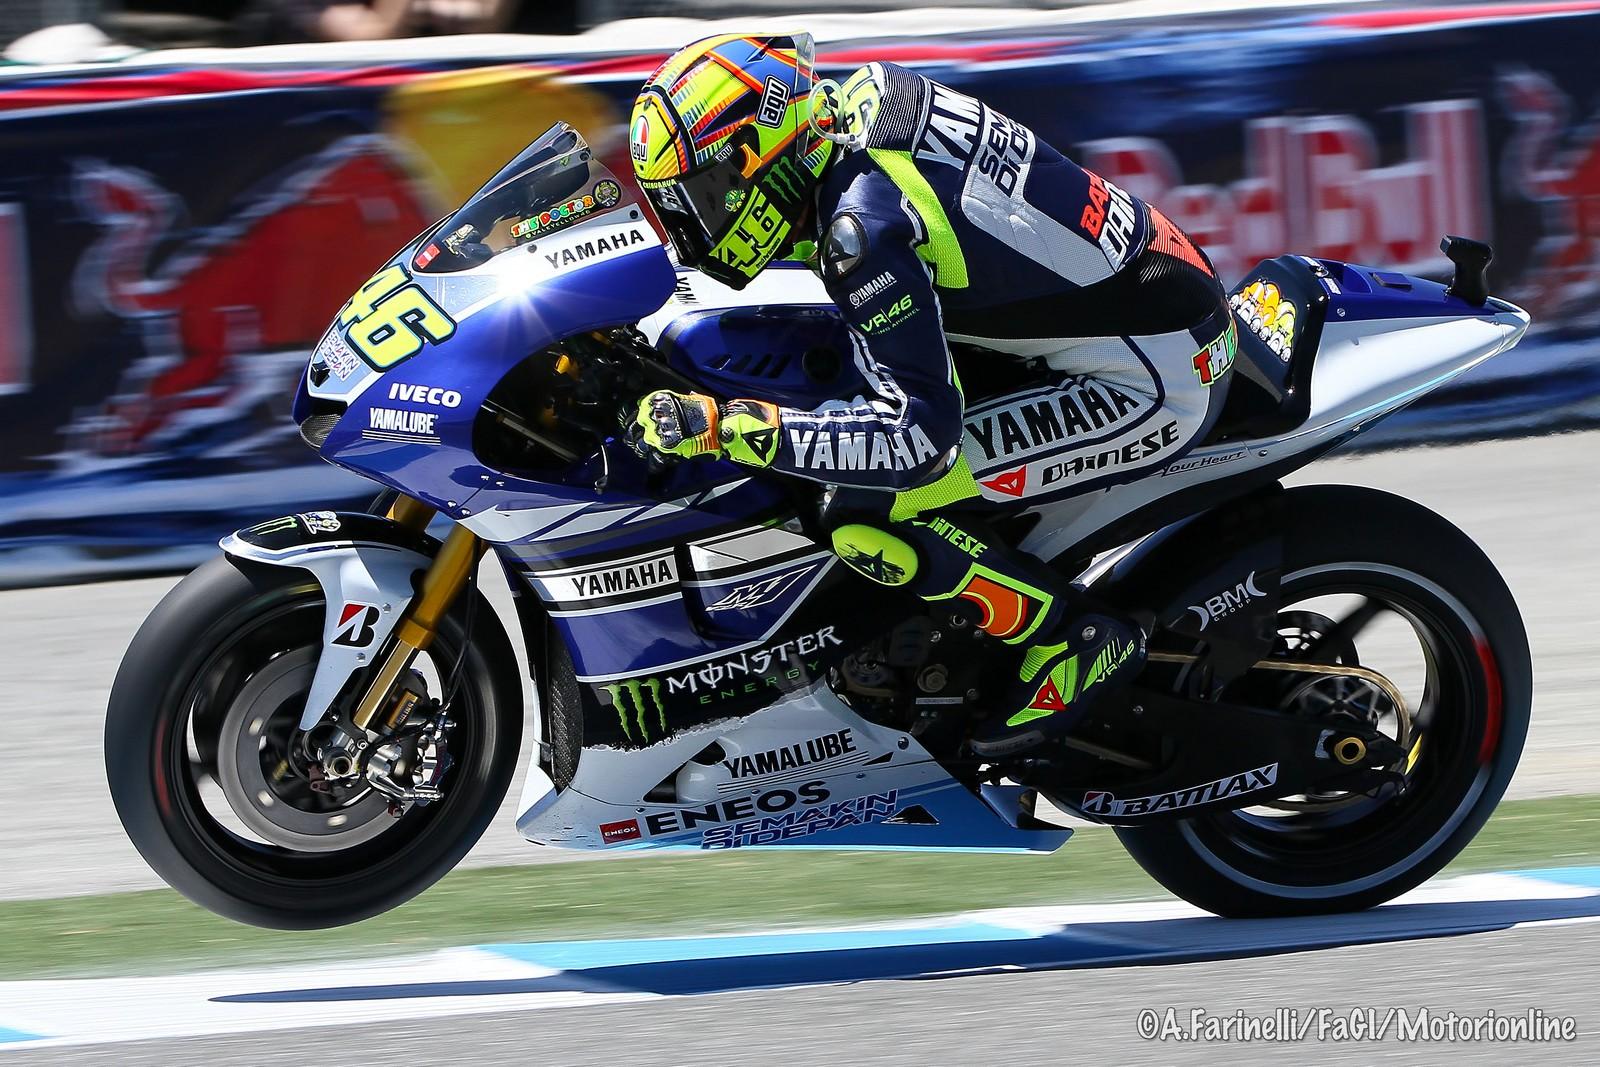 Motogp 13 Game Laguna Seca | MotoGP 2017 Info, Video, Points Table